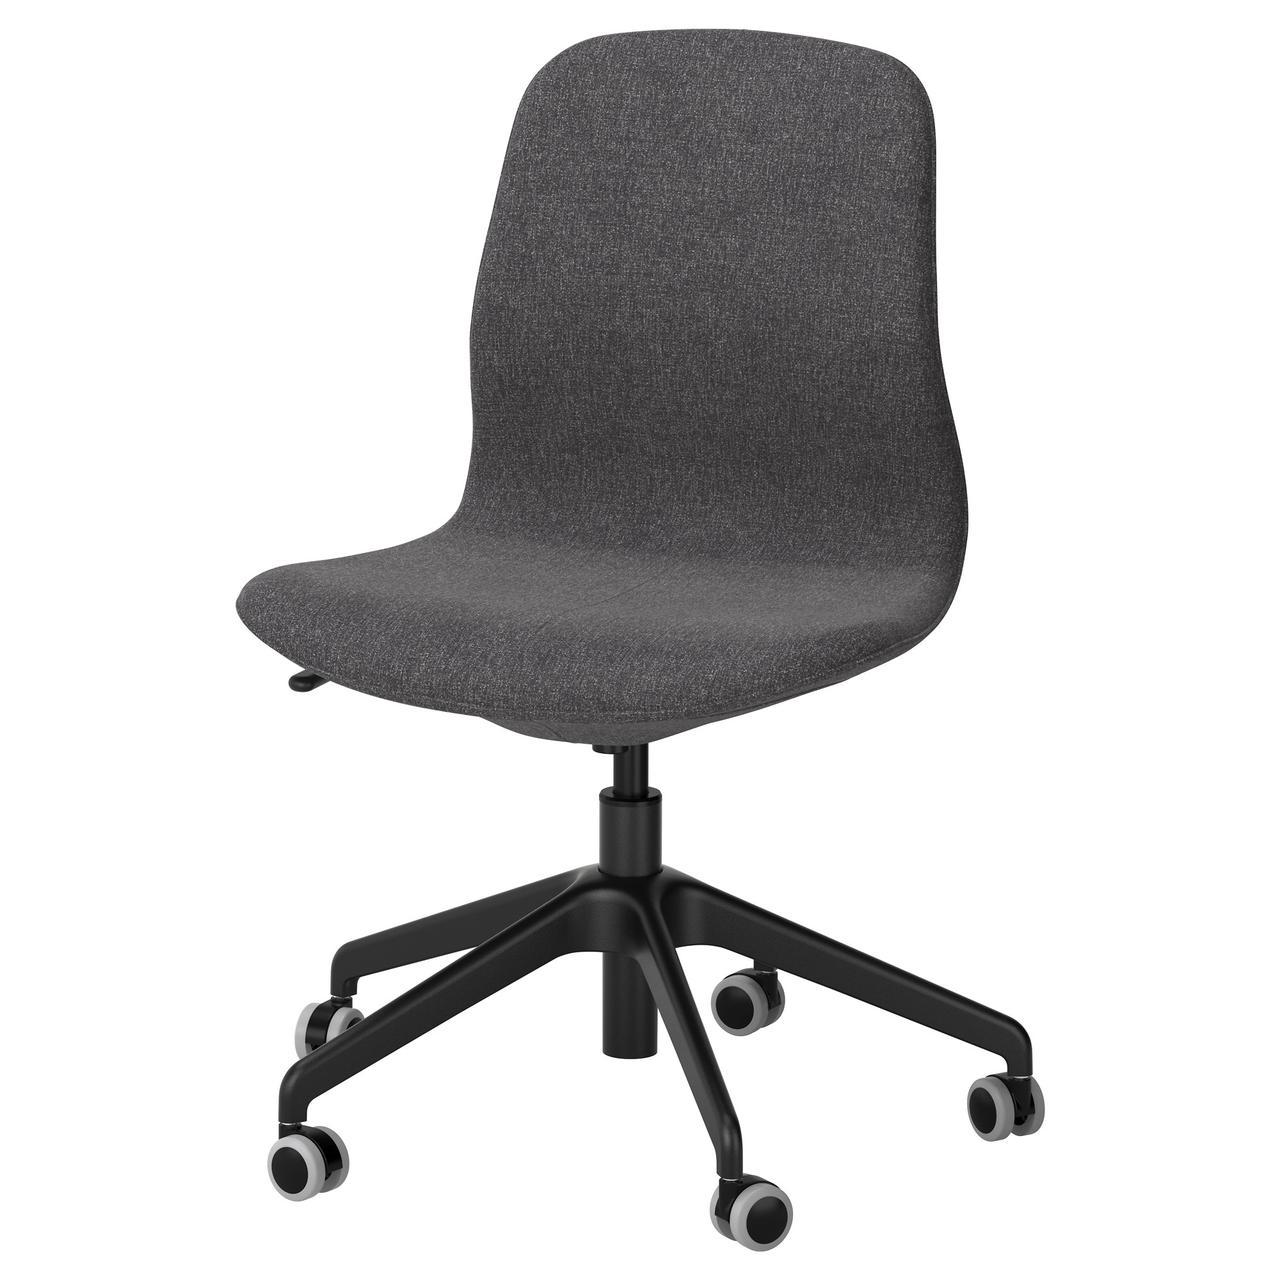 IKEA LANGFJALL (291.775.74) Рабочий стул, Gunnared светло-розовый, черный